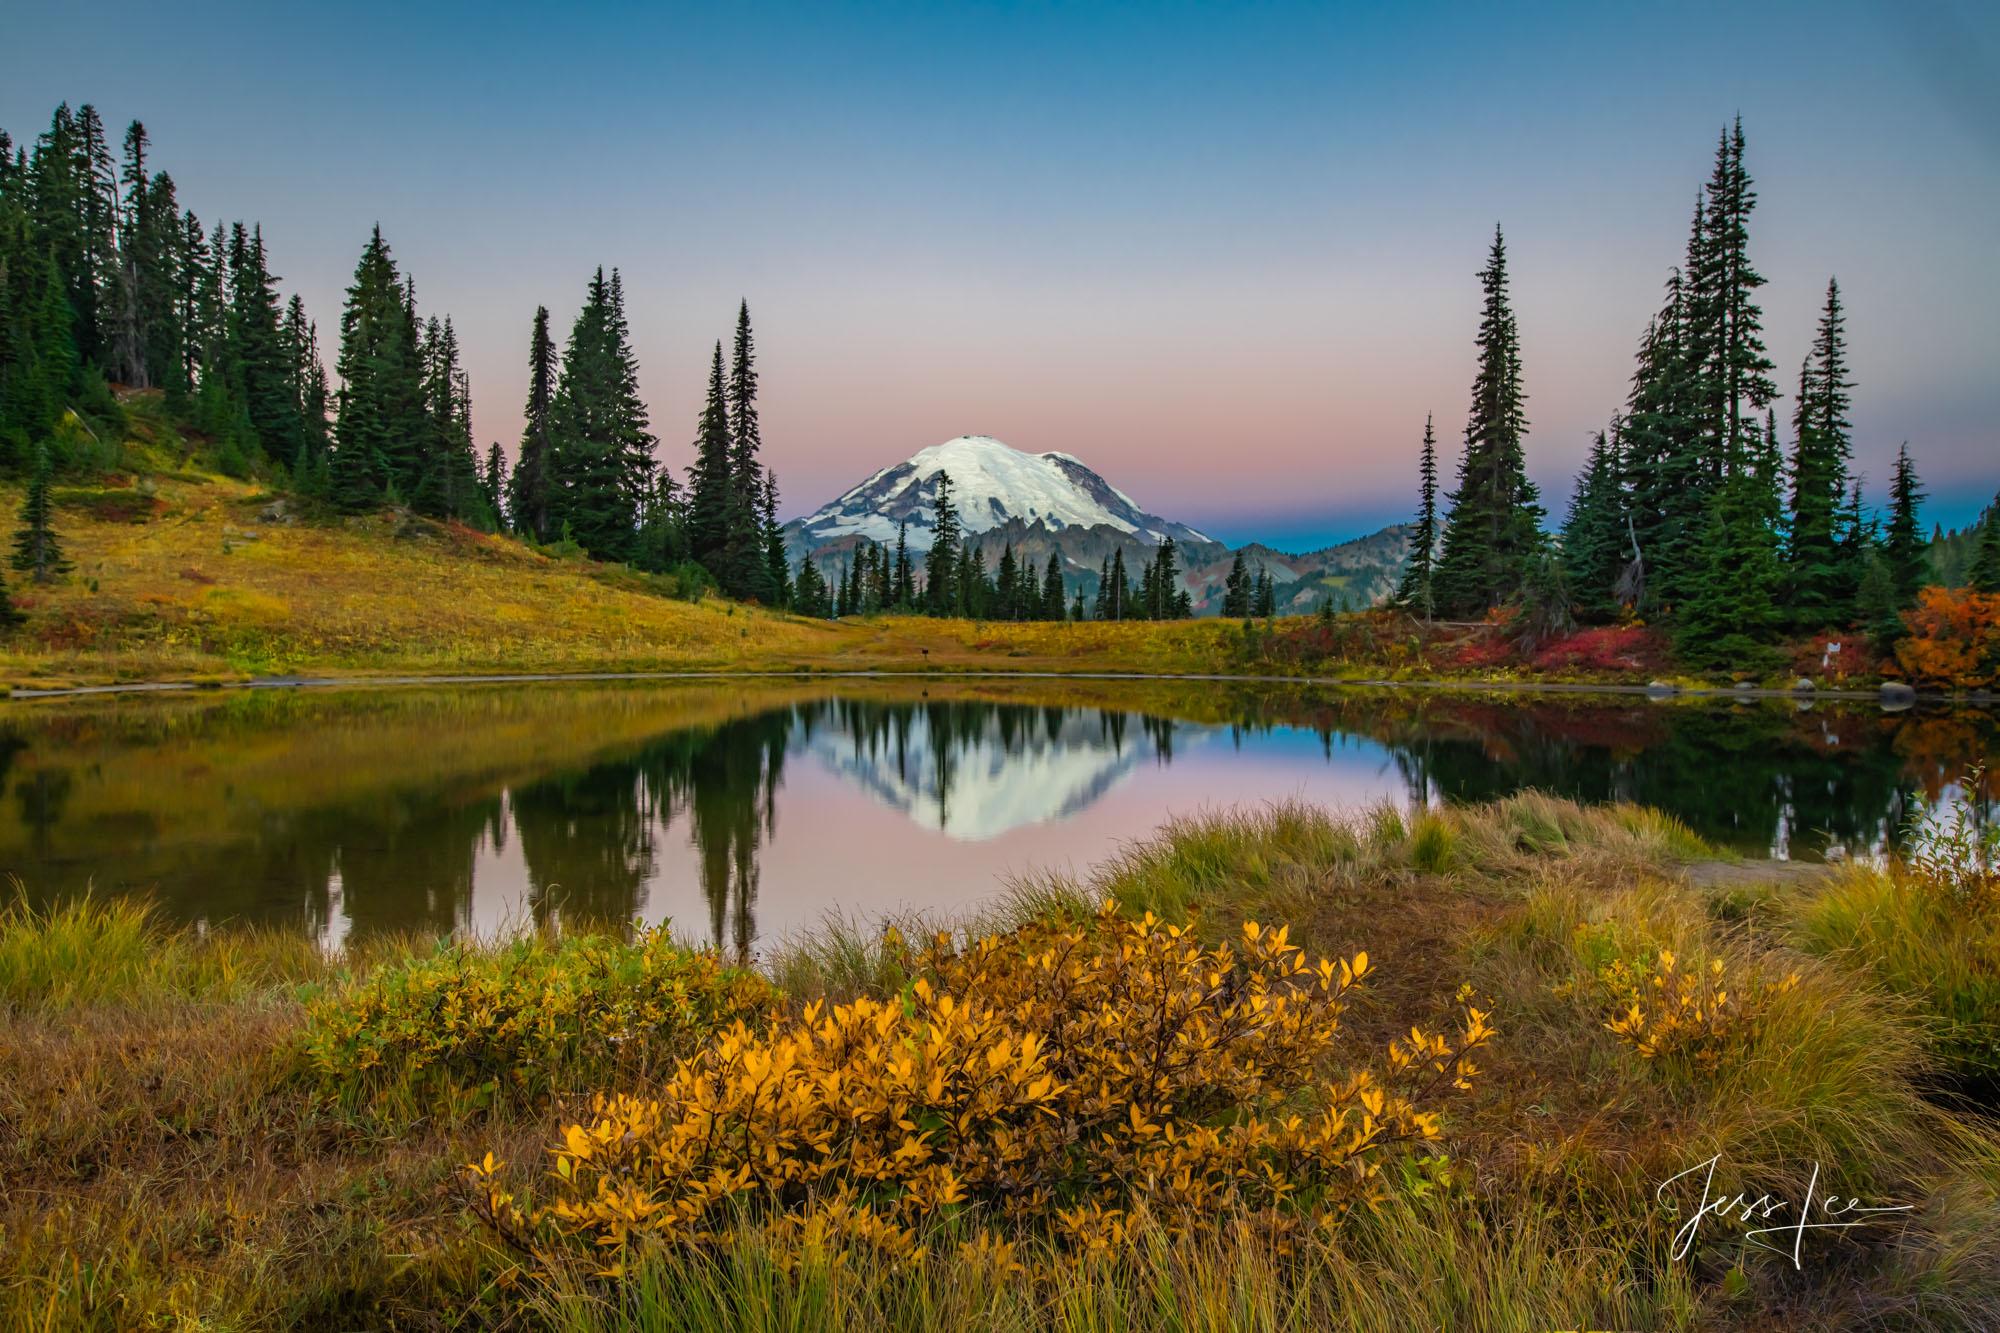 photo of Mount Rainier, Washington, National Park, landscape, mountains, trees, snow, fall, color, autumn, PNW, Pacific Northwest, Tipsoo Lake , photo